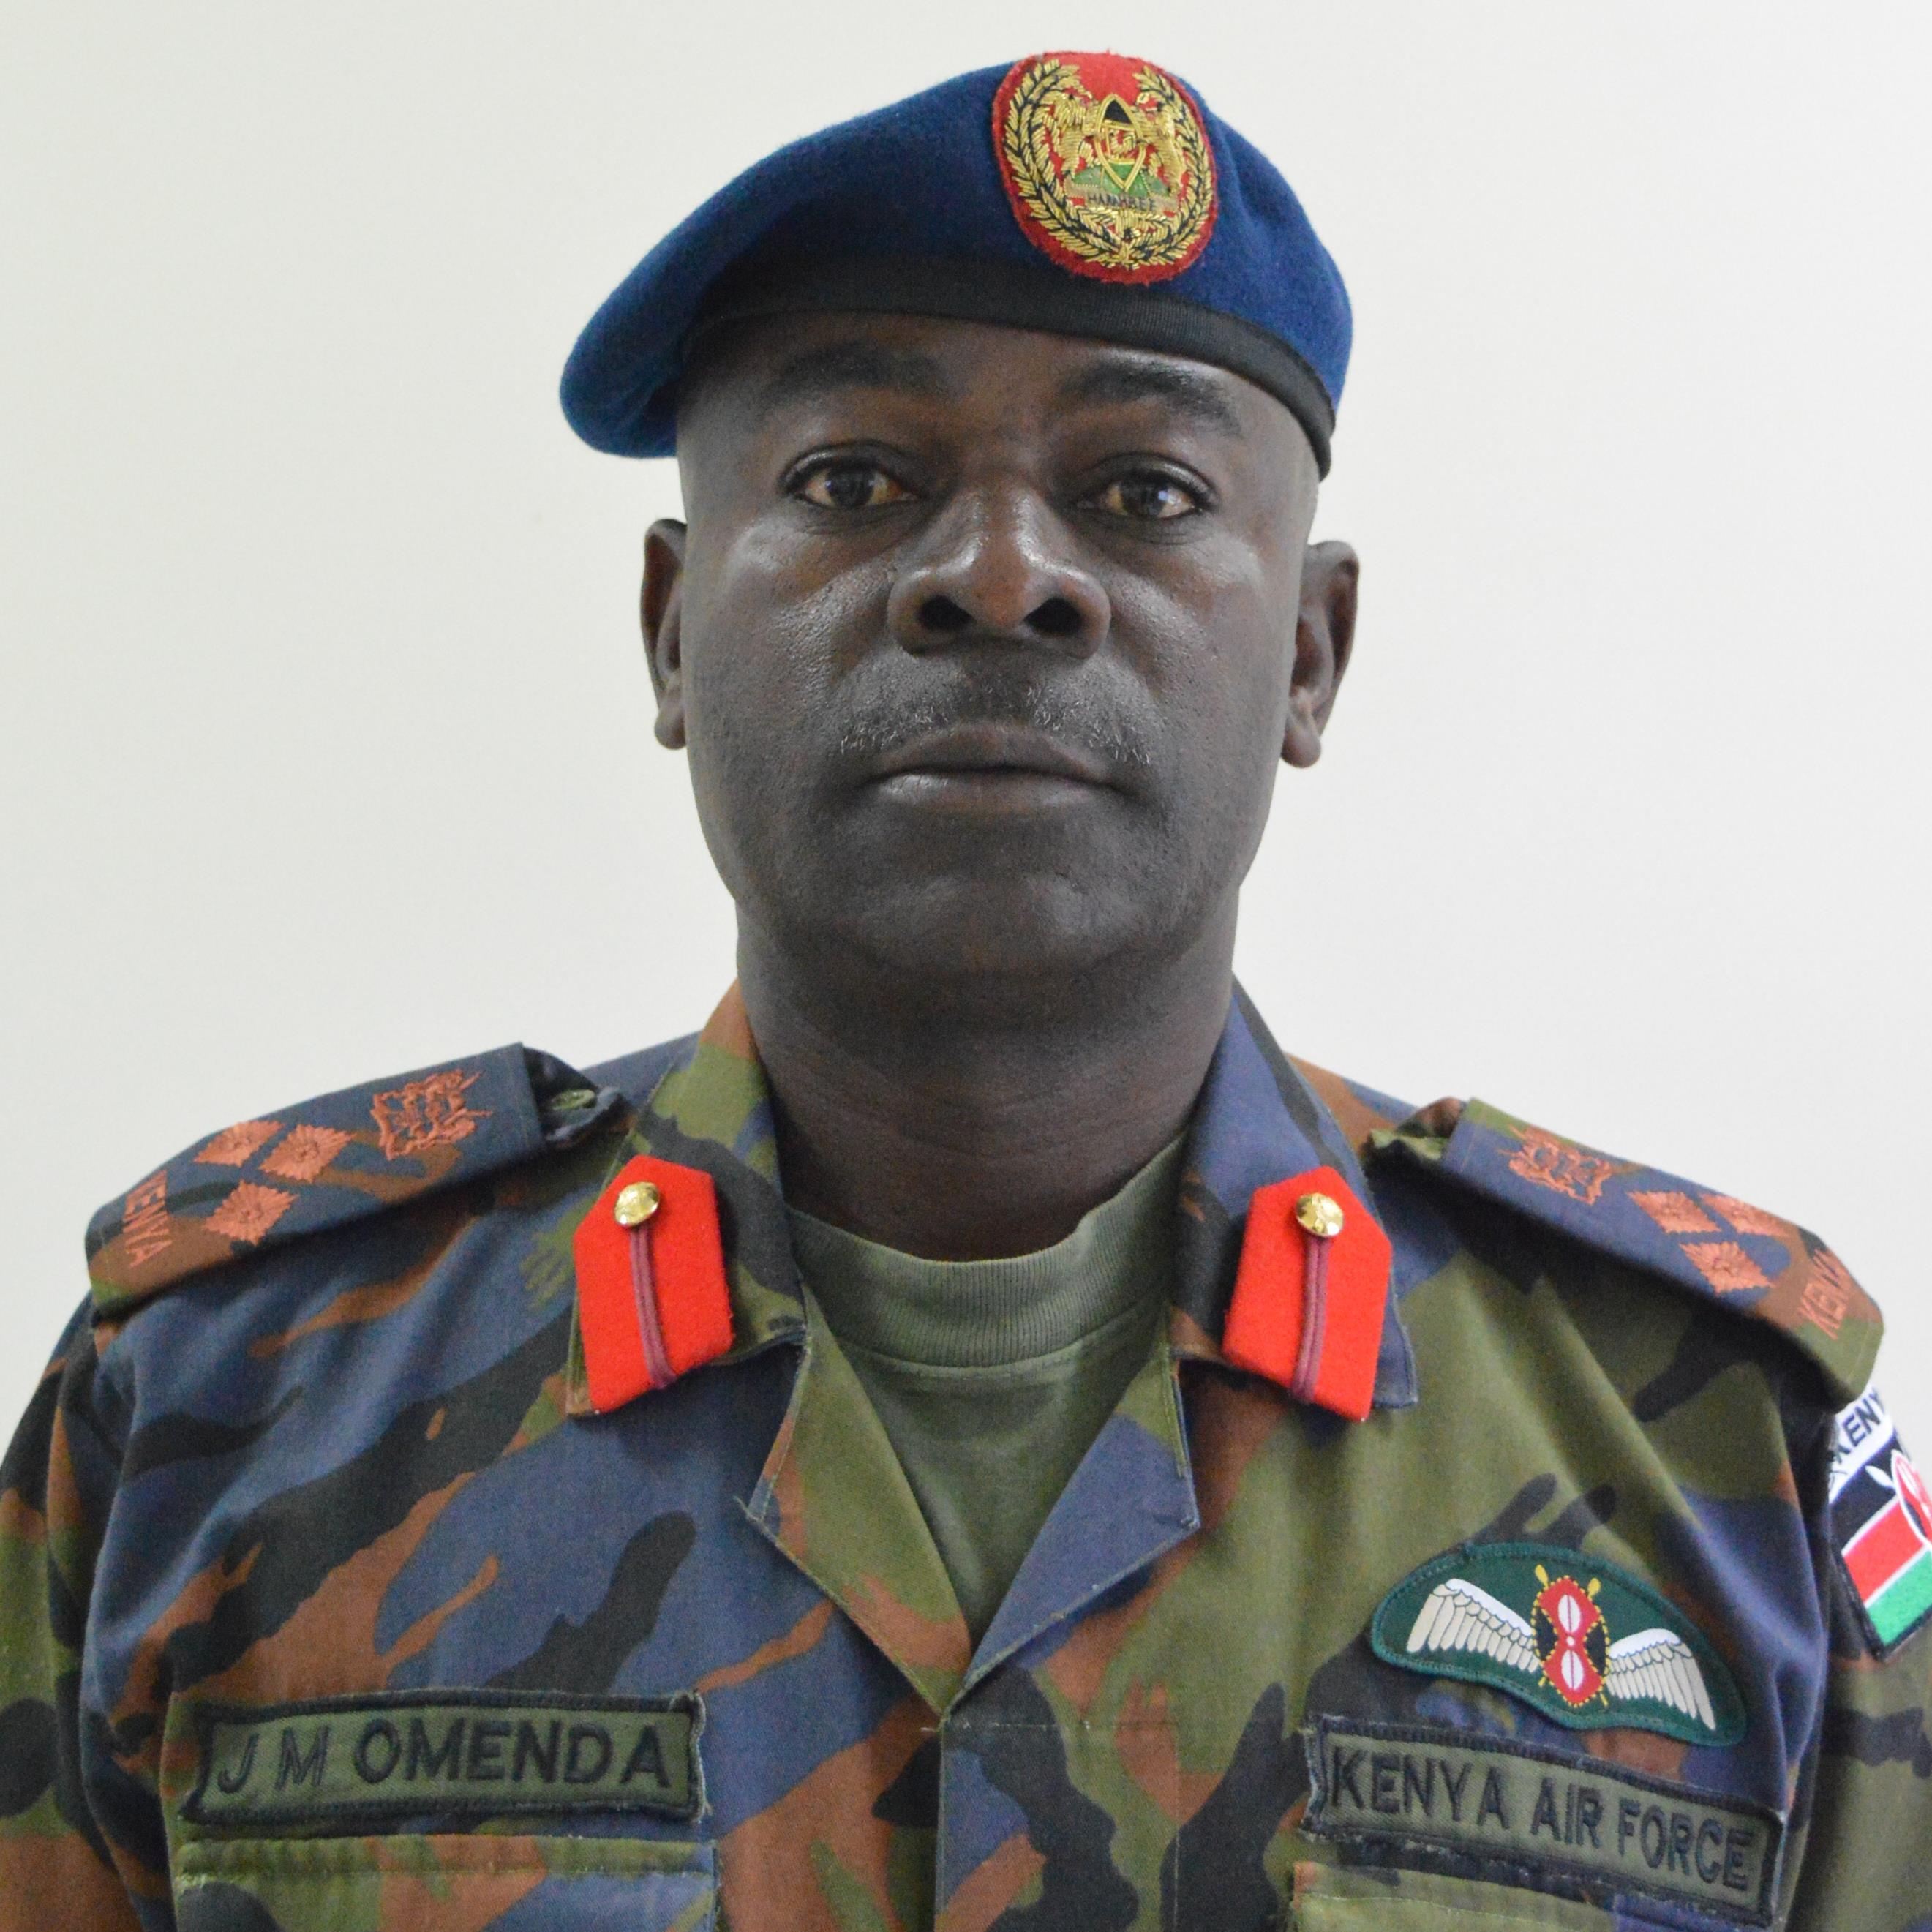 Brigadier John Mugaravai Omenda